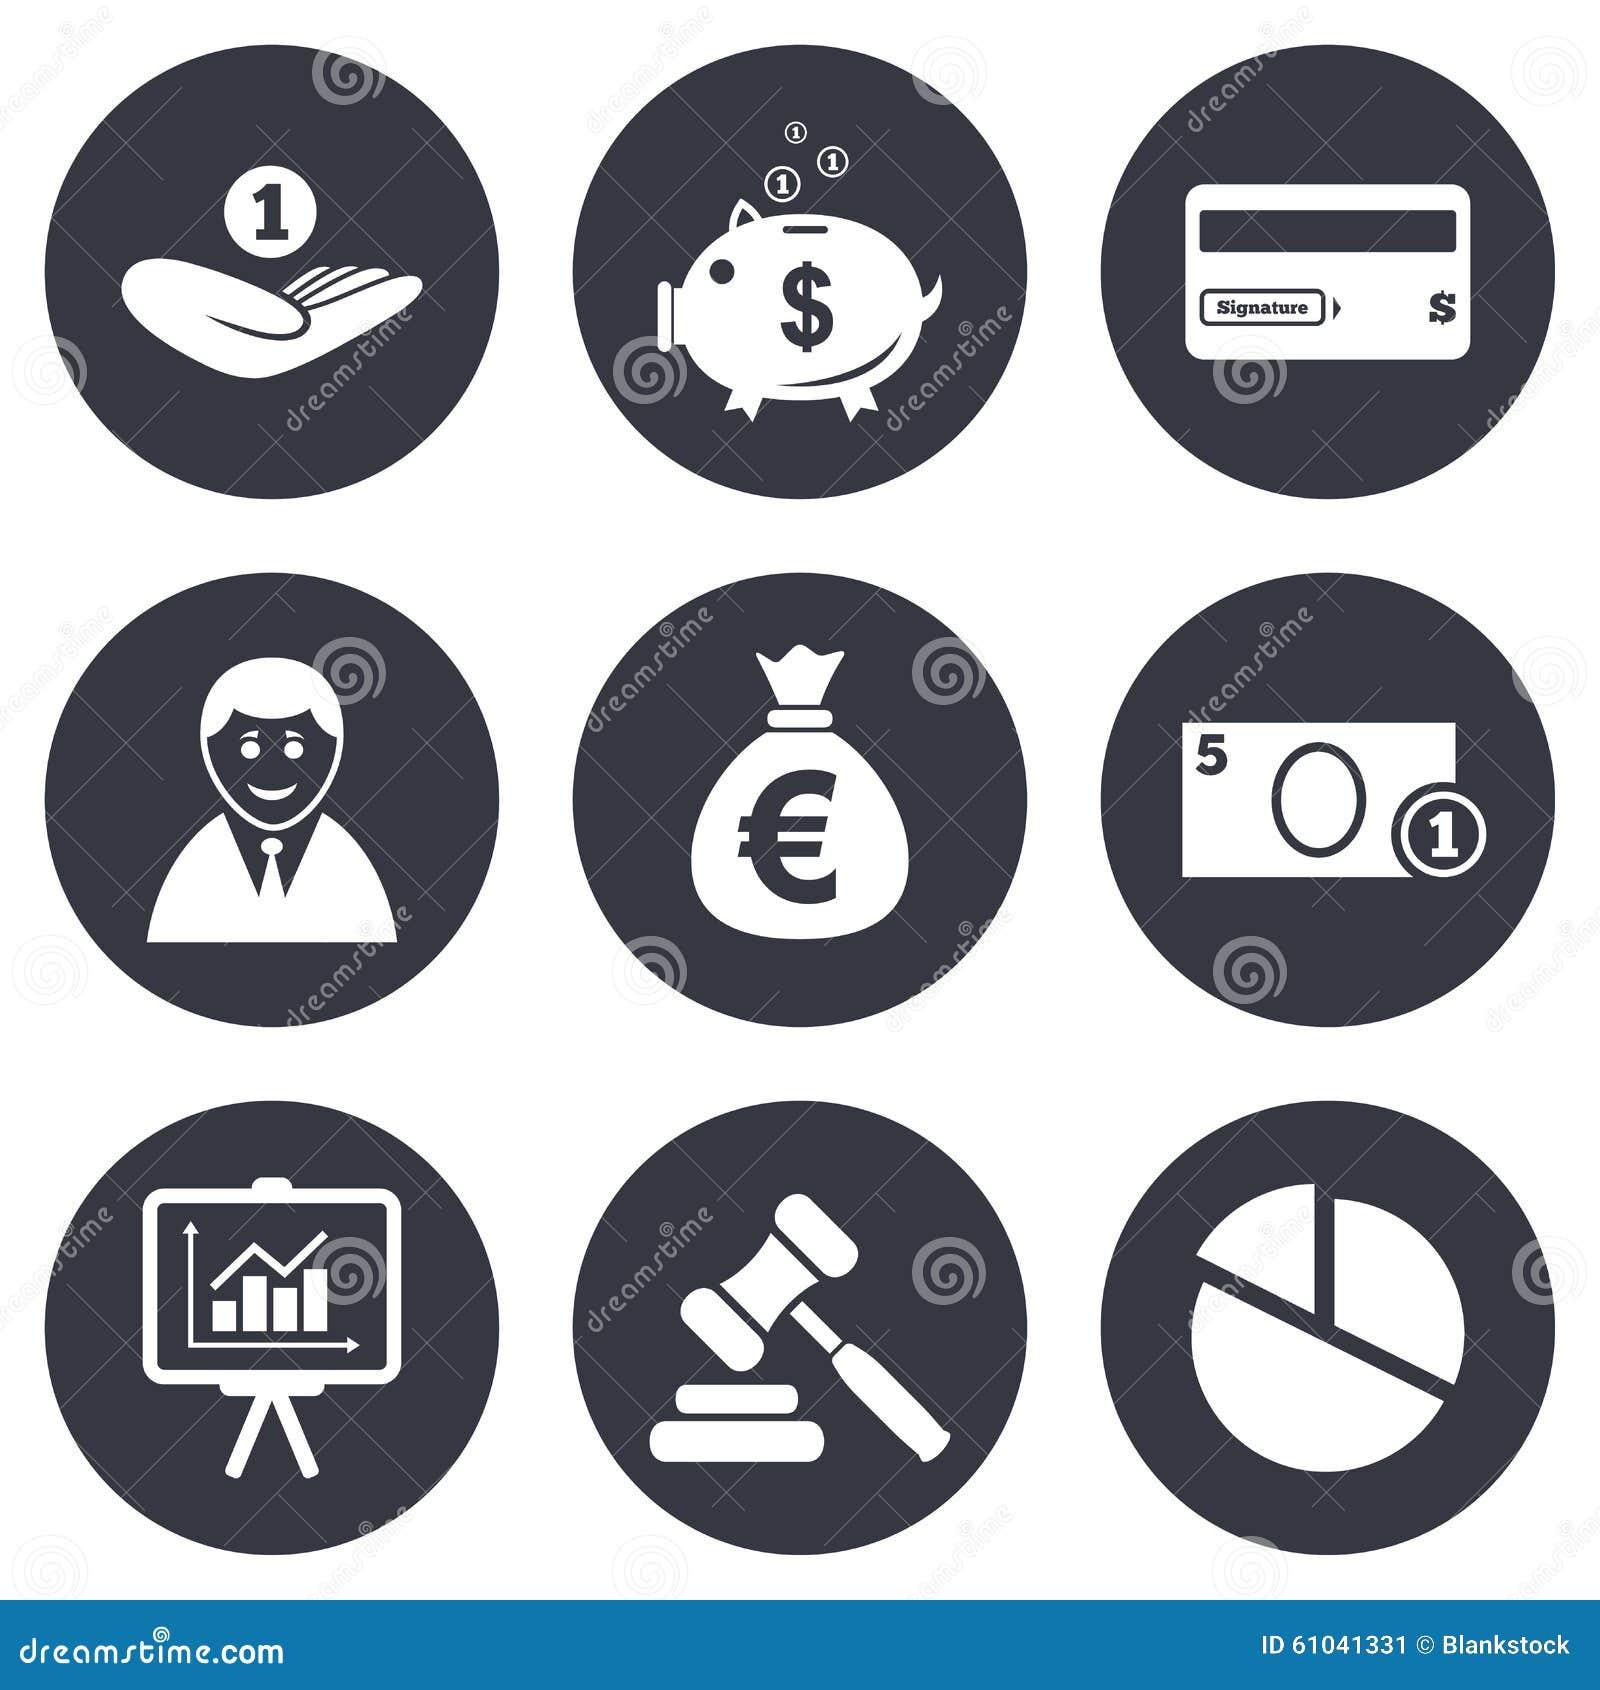 Money, Cash And Finance Icons. Piggy Bank Sign Stock ... X Arrow Money Bag